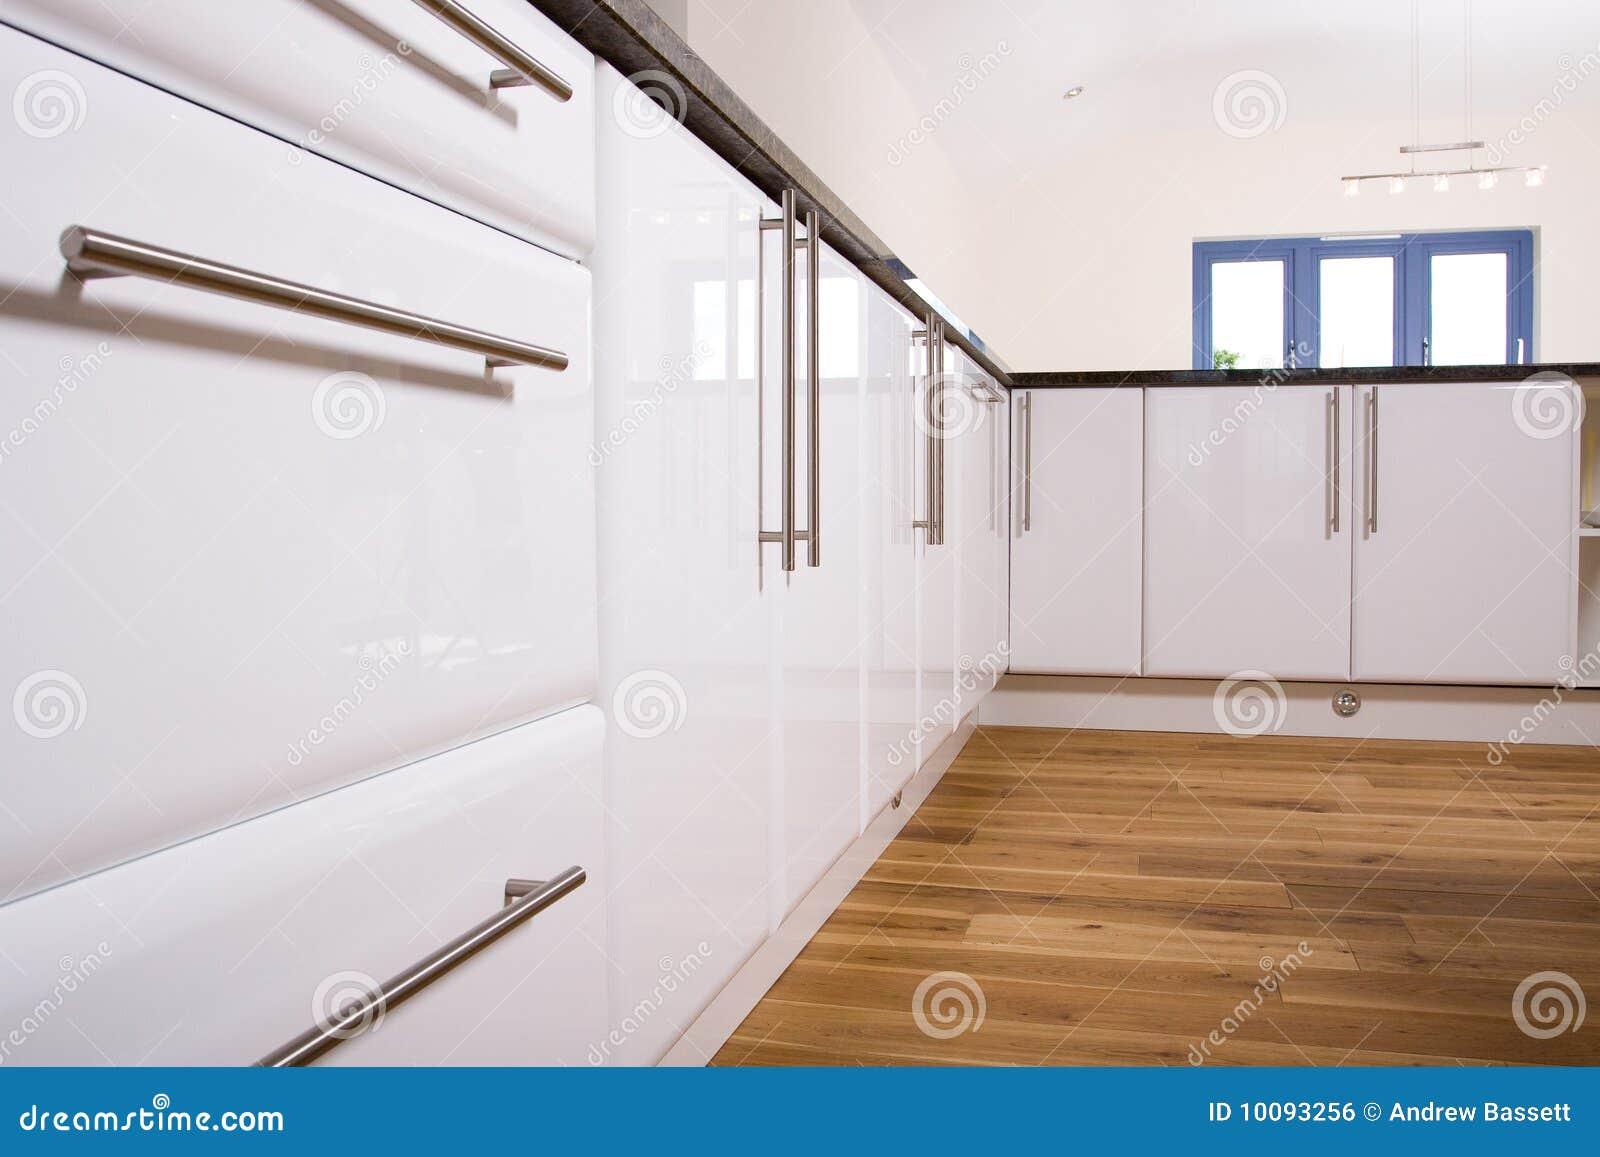 belle cuisine moderne image libre de droits image 10093256. Black Bedroom Furniture Sets. Home Design Ideas